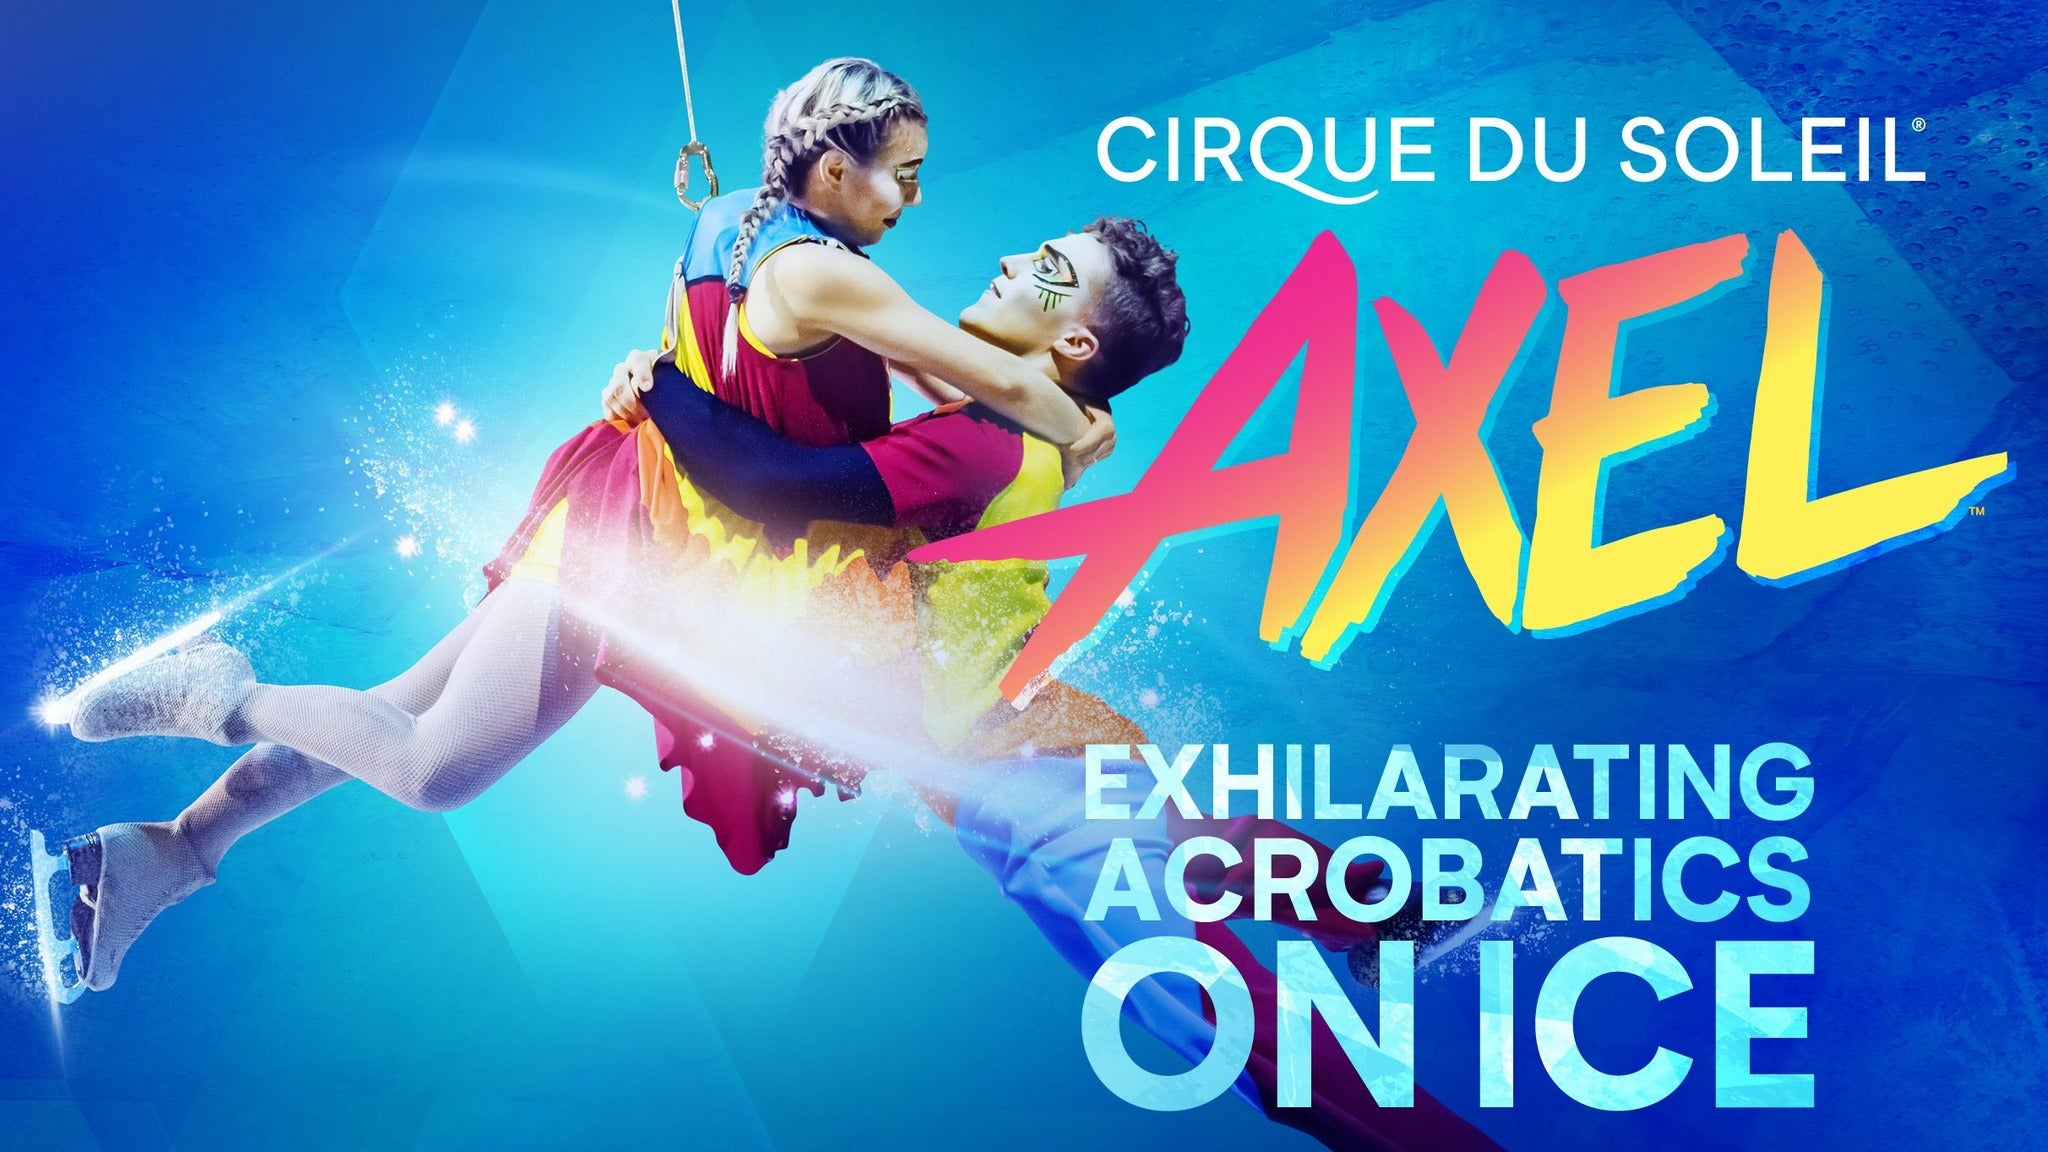 Cirque du Soleil: Axel at Mechanics Bank Arena